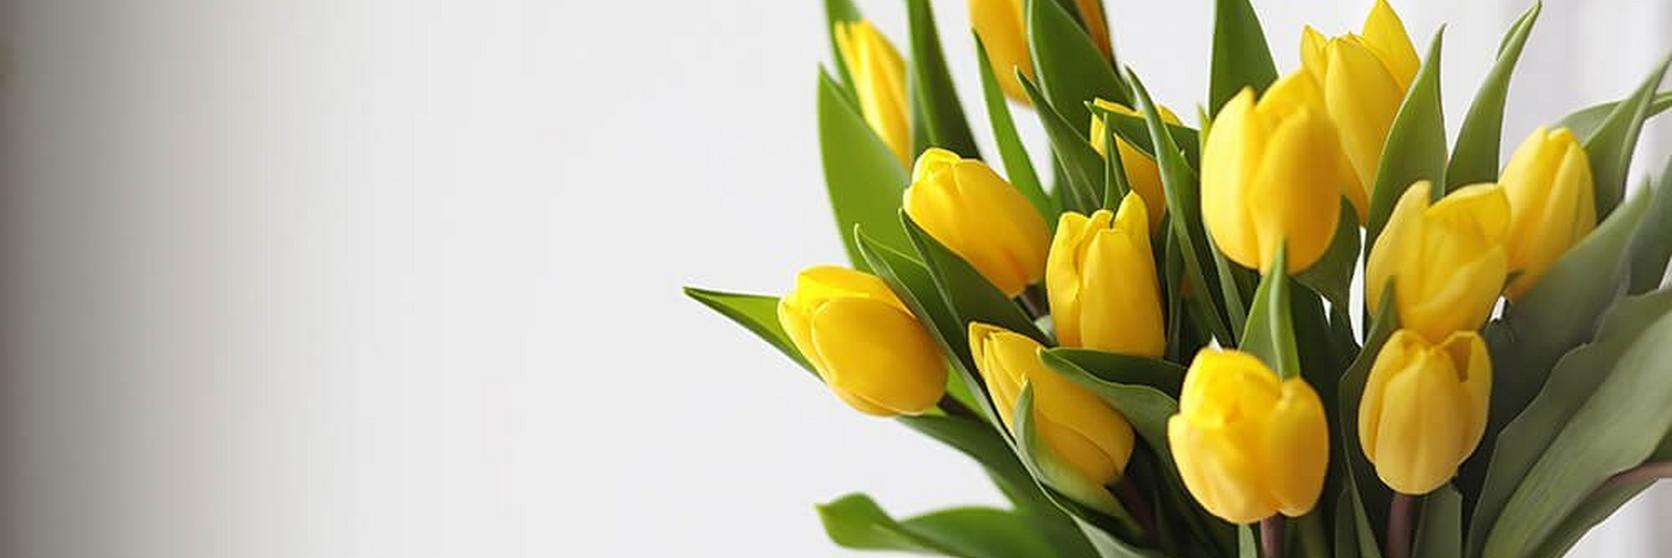 yellow-tulips-ultimate-flower